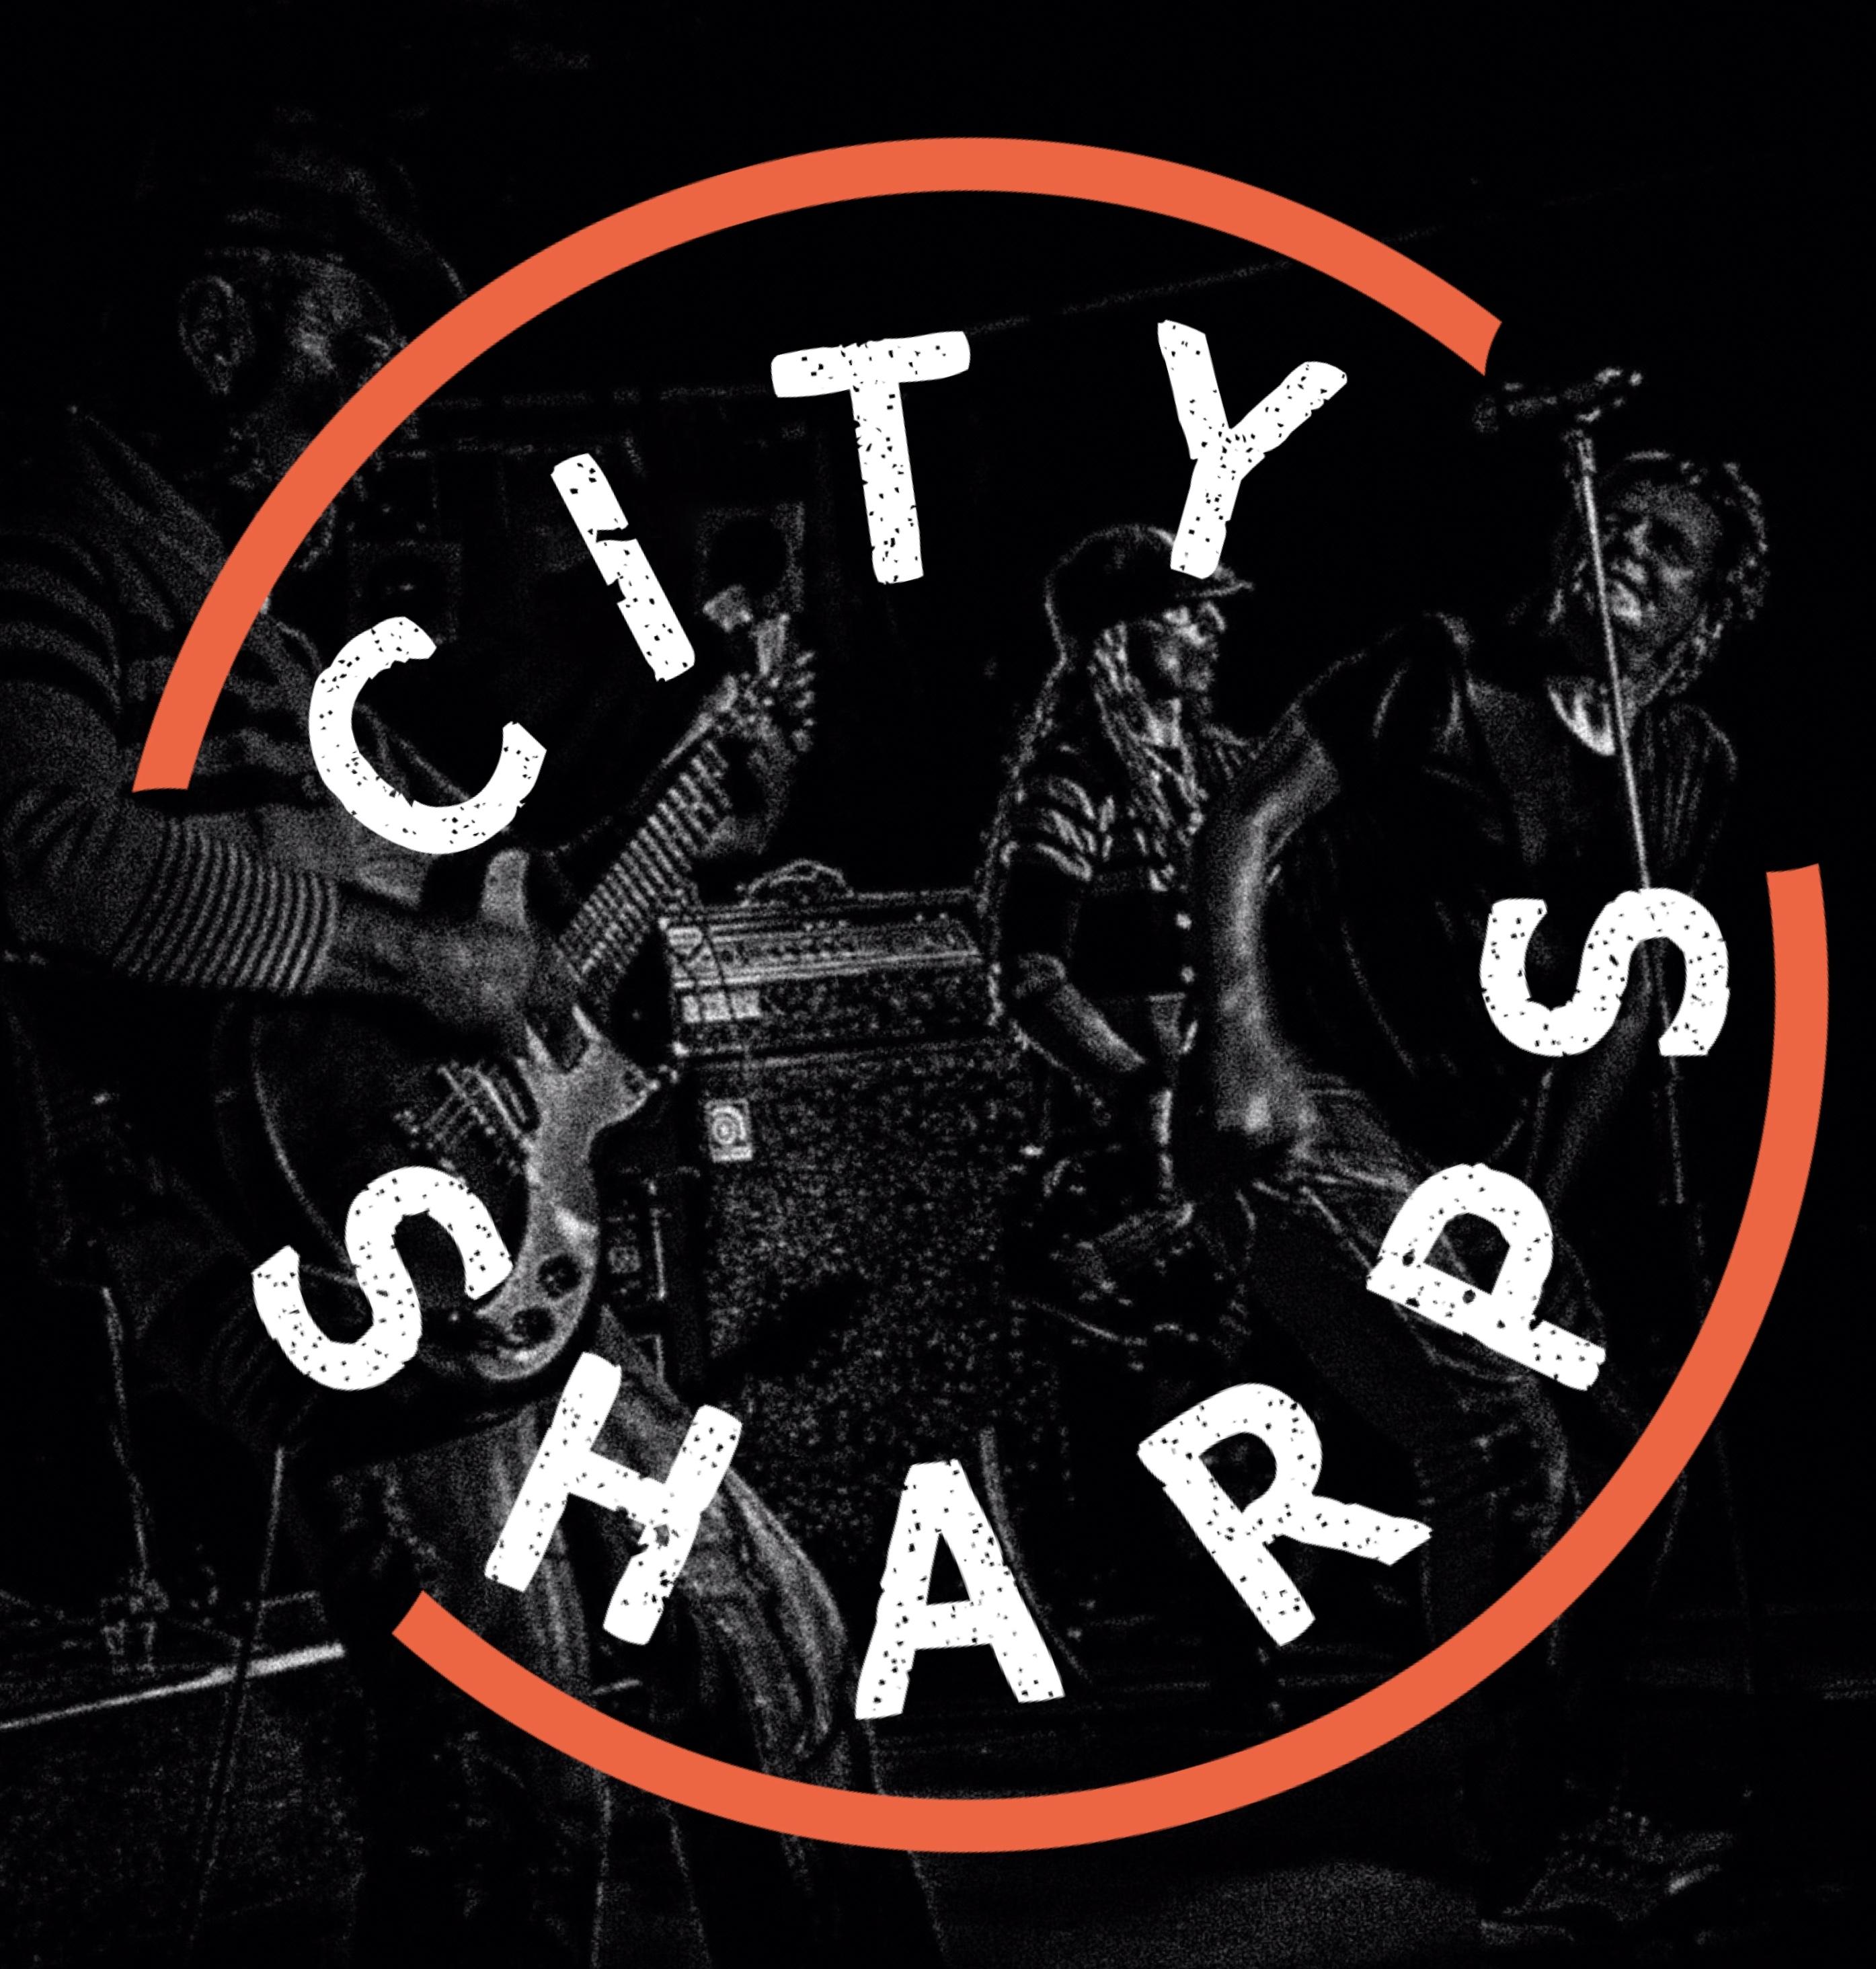 CITY SHARPS